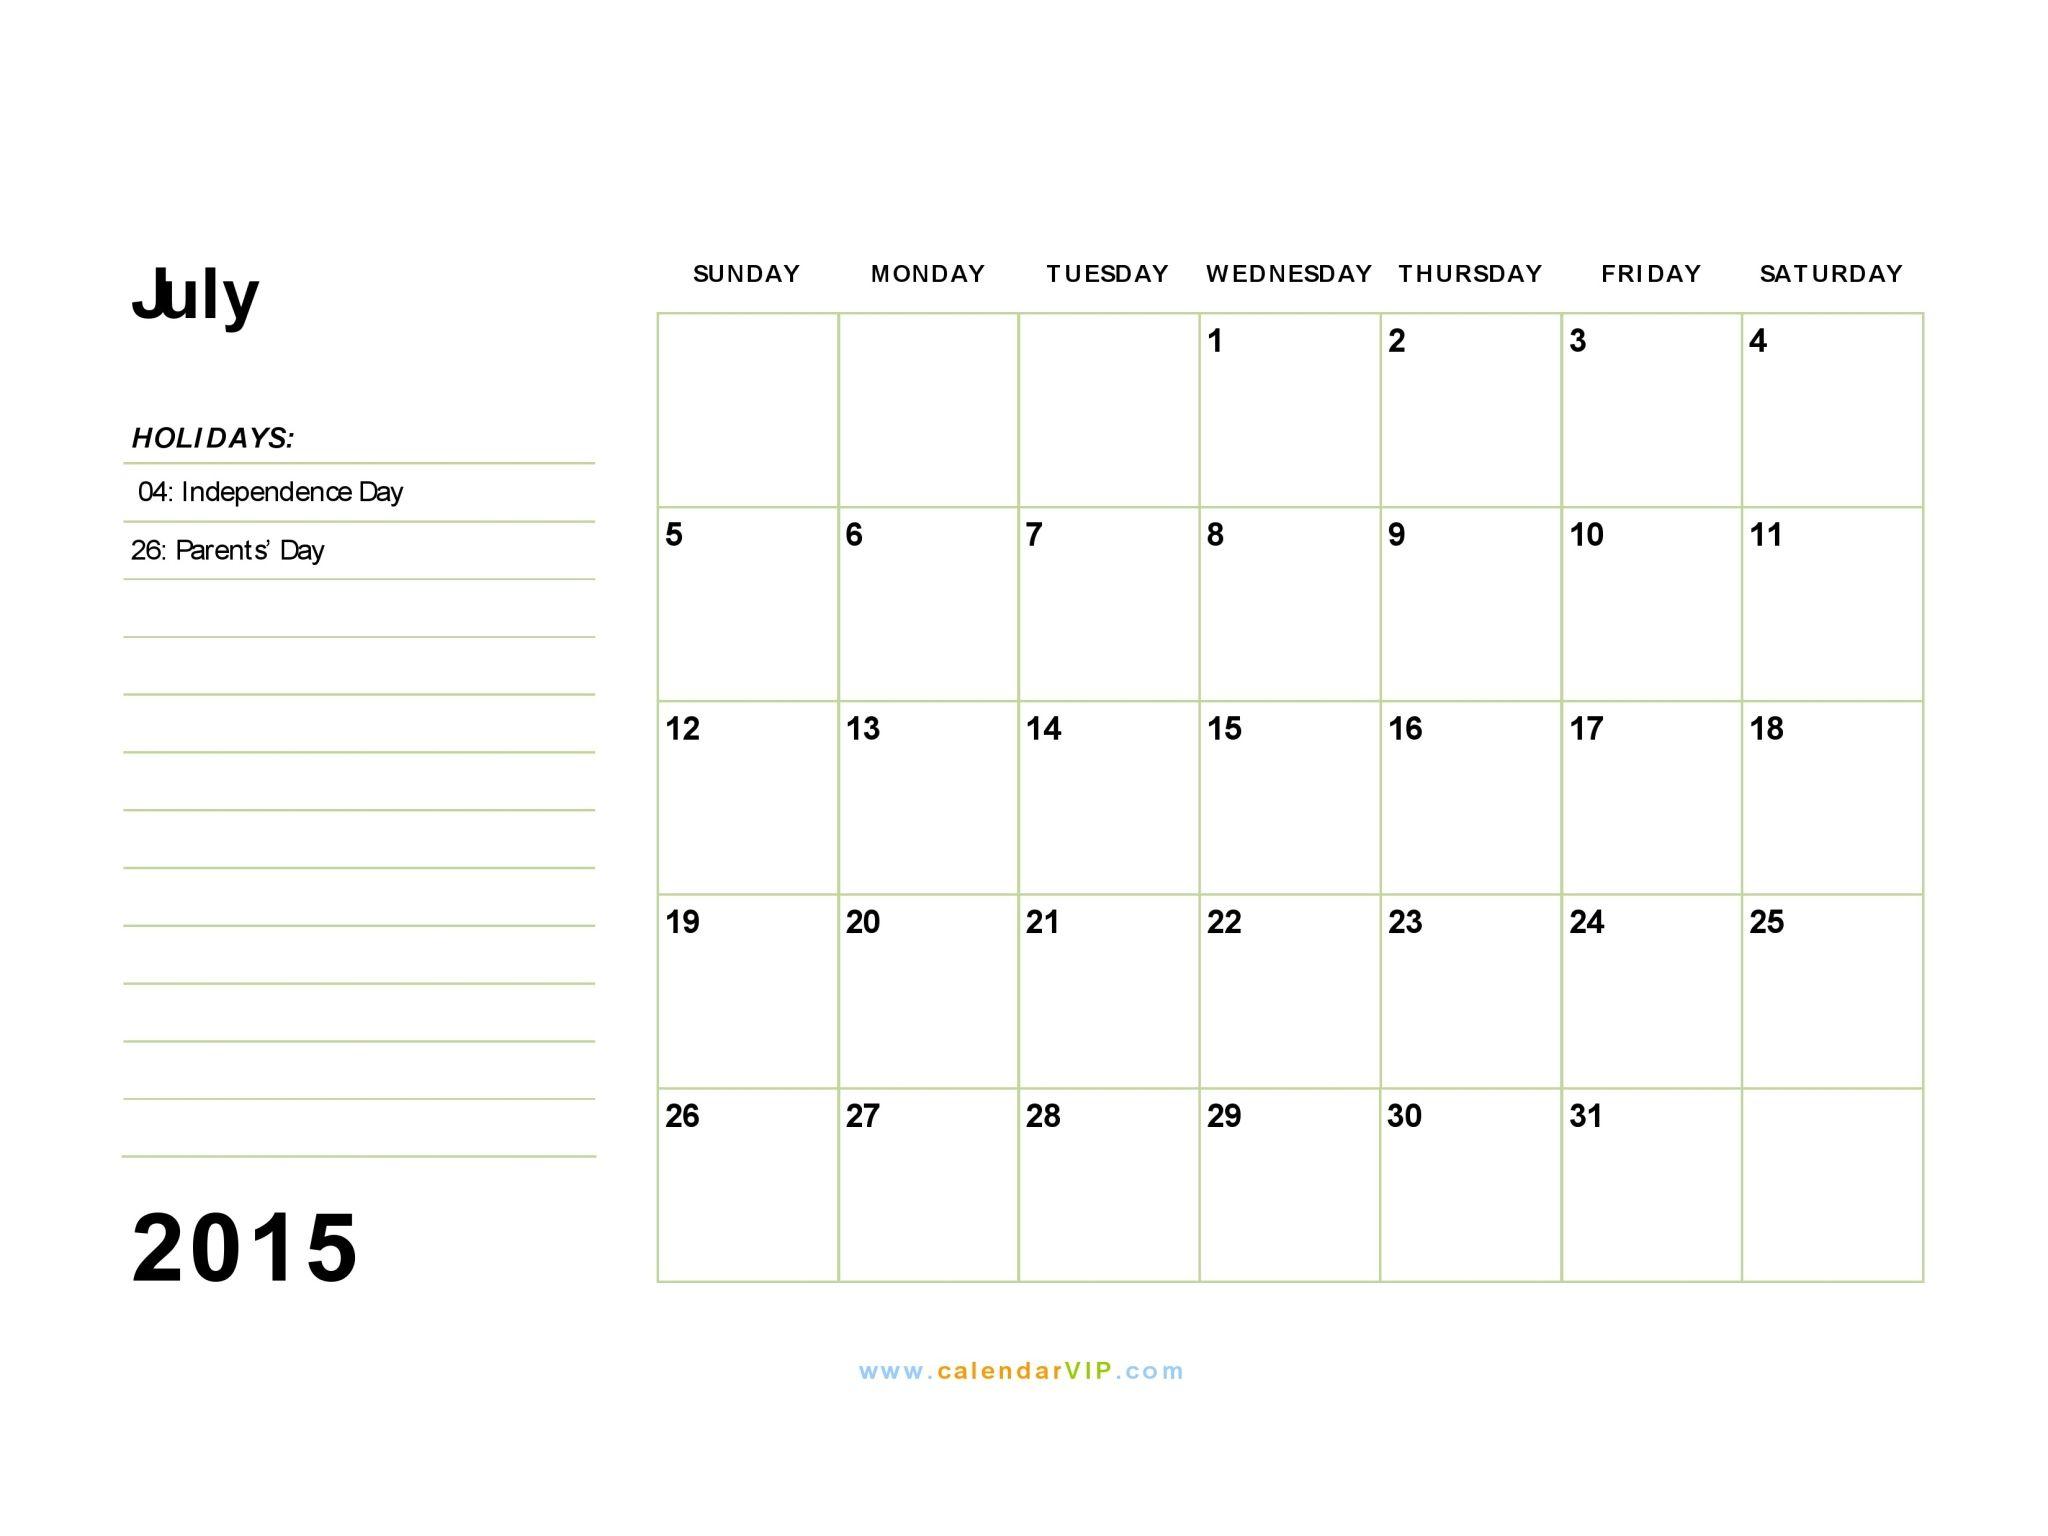 July 2015 Calendar Fillable Calendar Template 2015 Free Printable Calendar Small Business Blog 2015 Calendar Printable